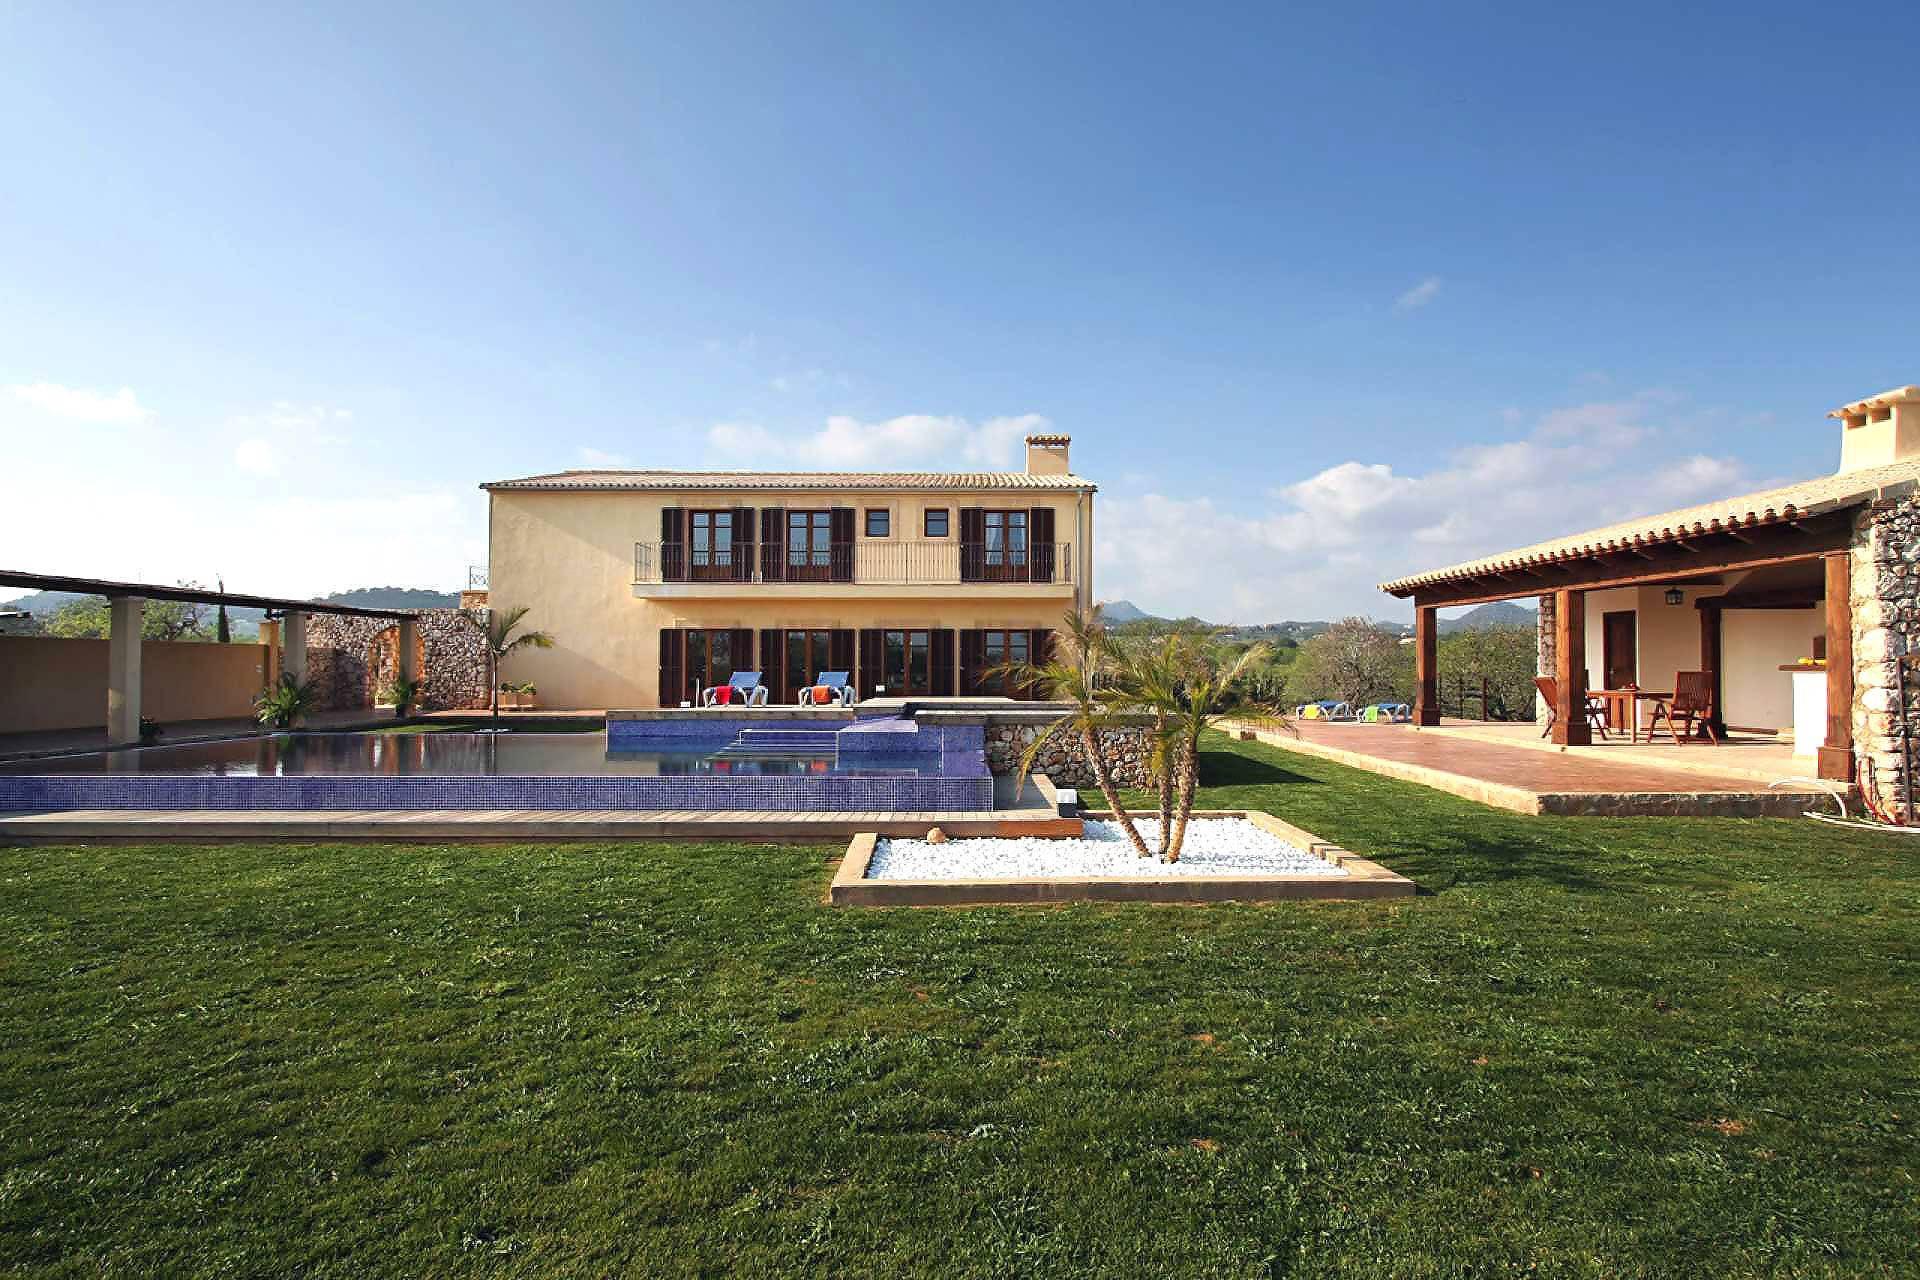 01-58 Moderne Finca Mallorca Osten Bild 3